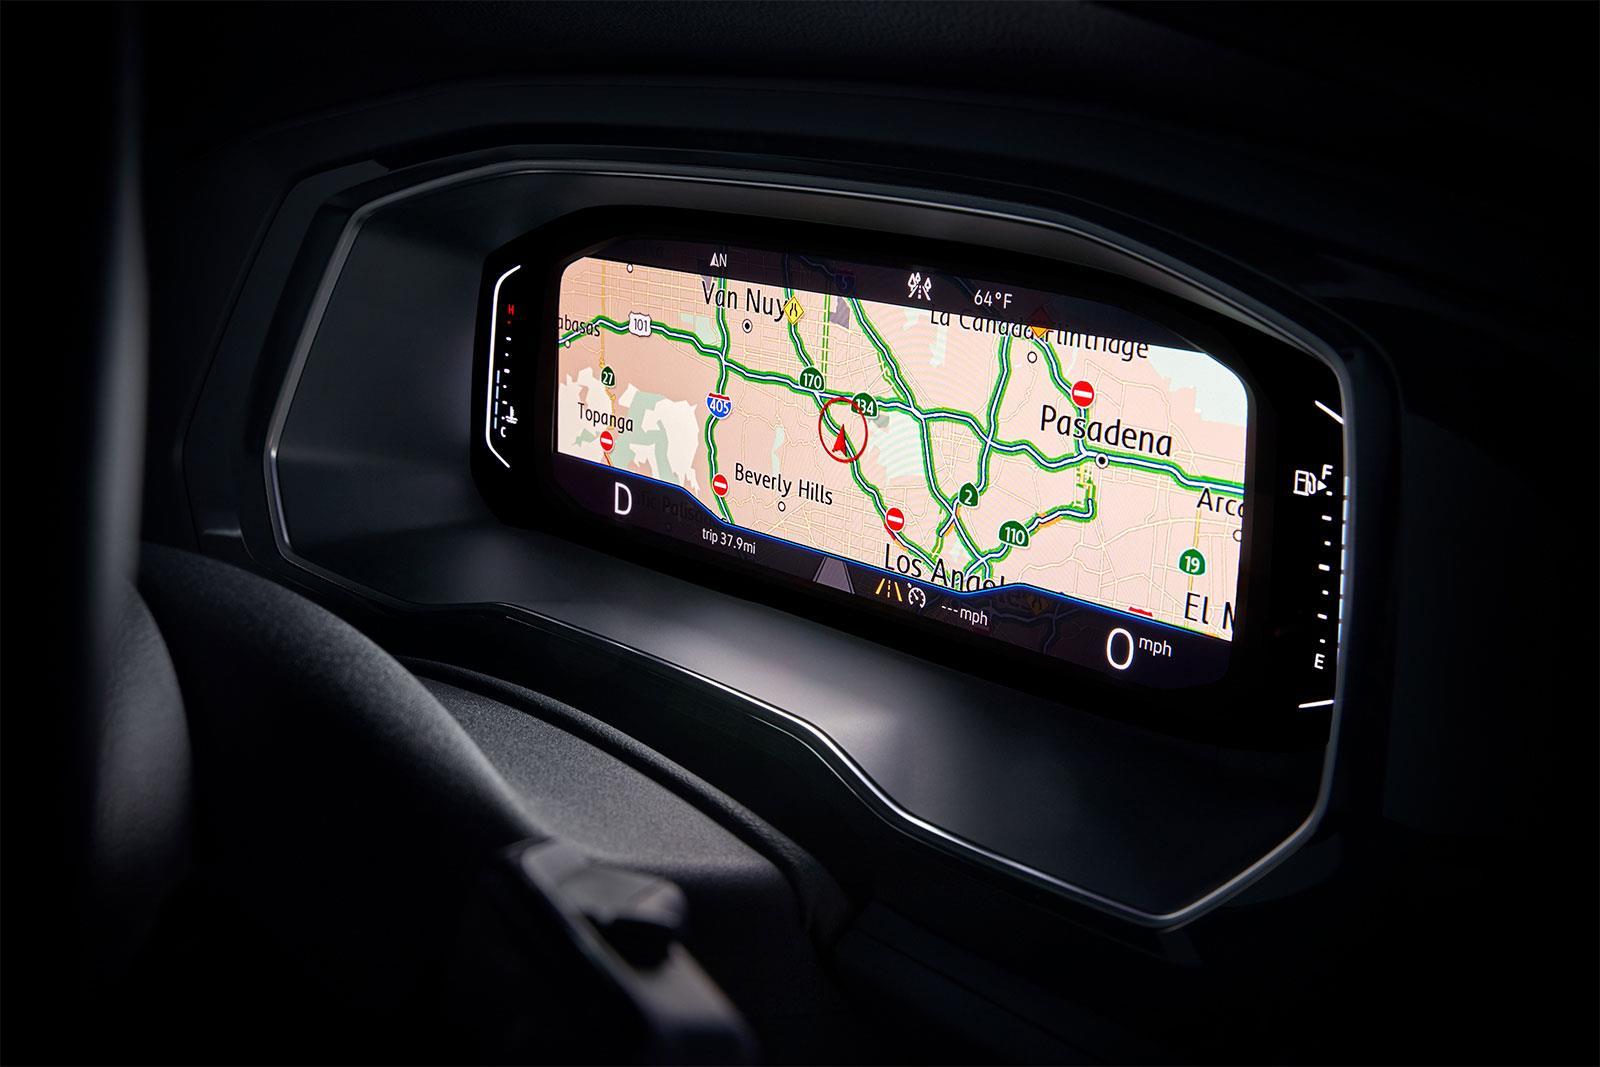 Tablero digital personalizable de asistencia al conductor (Driver Assistance)